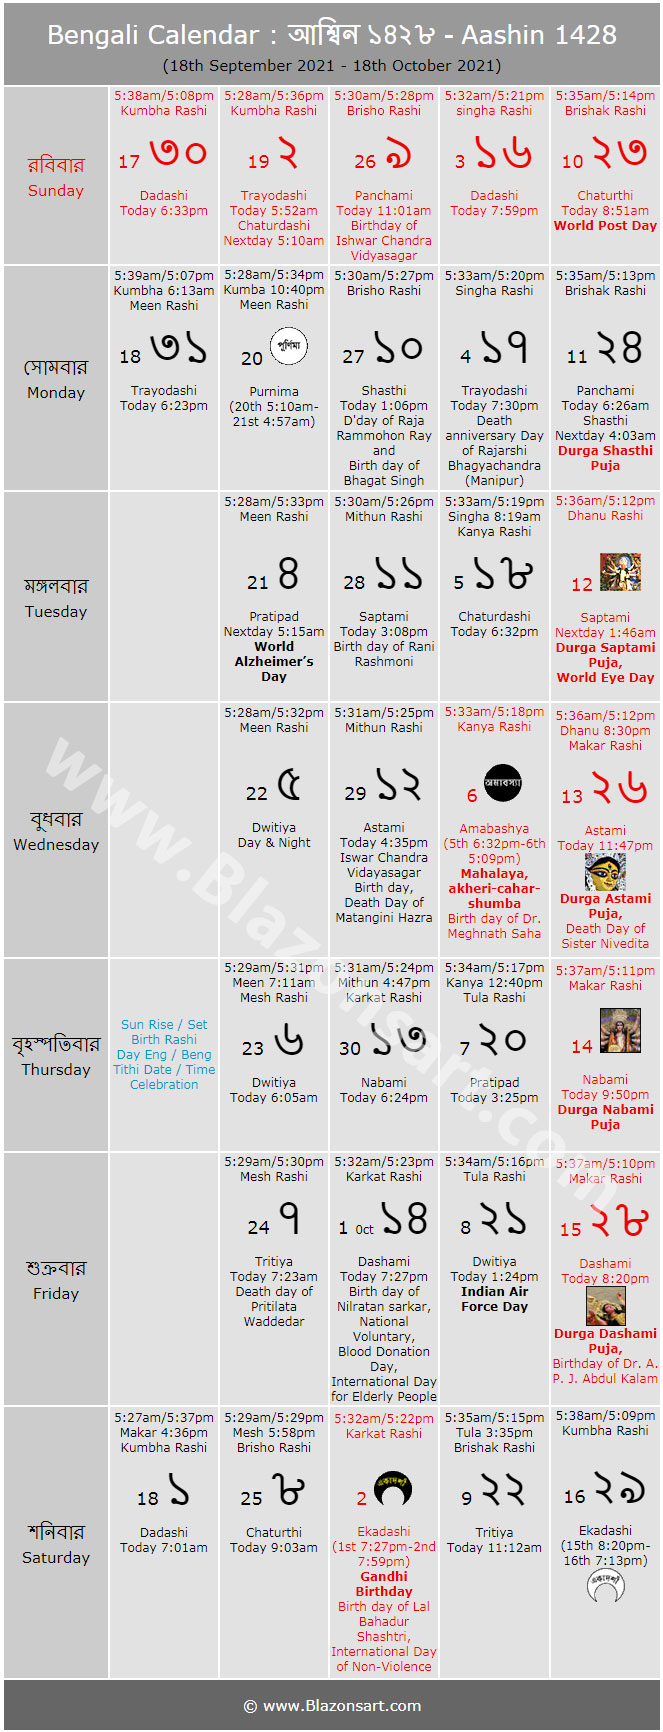 Bengali Calendar Aashin 1426 বাংলা কালেন্ডার আশ্বিন